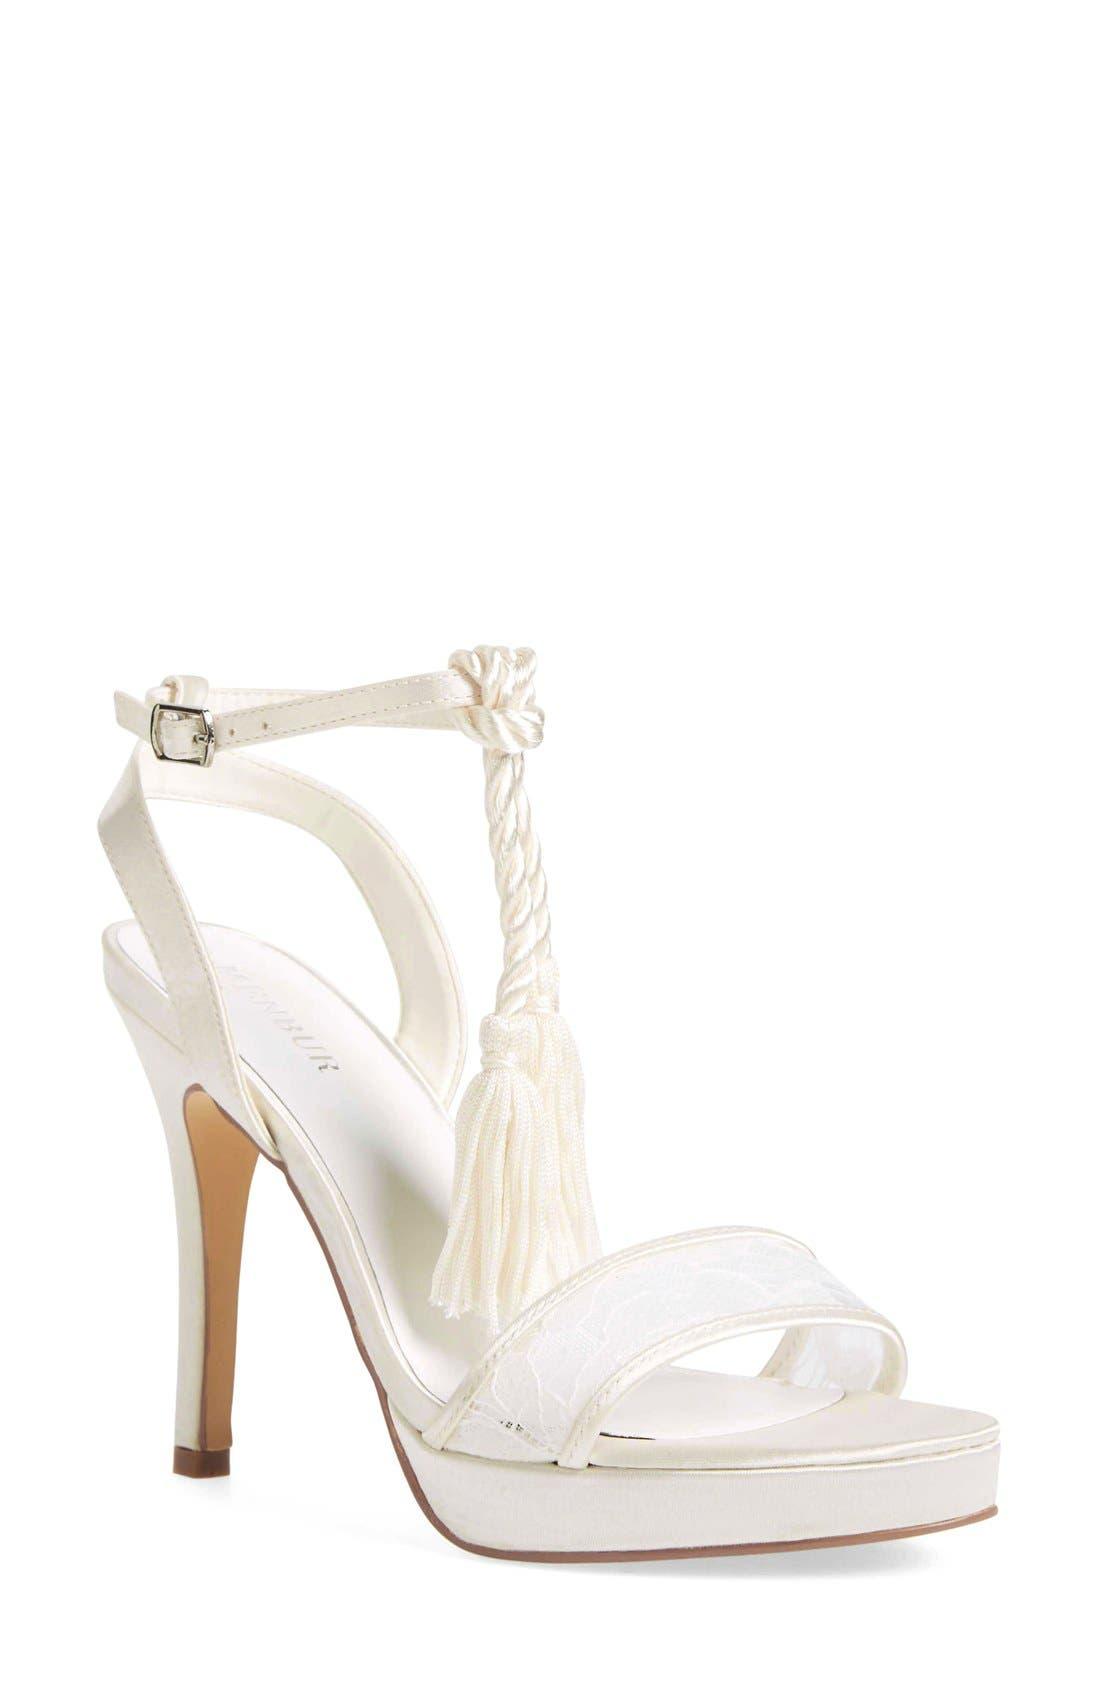 MENBUR 'Dalila' Bridal Sandal